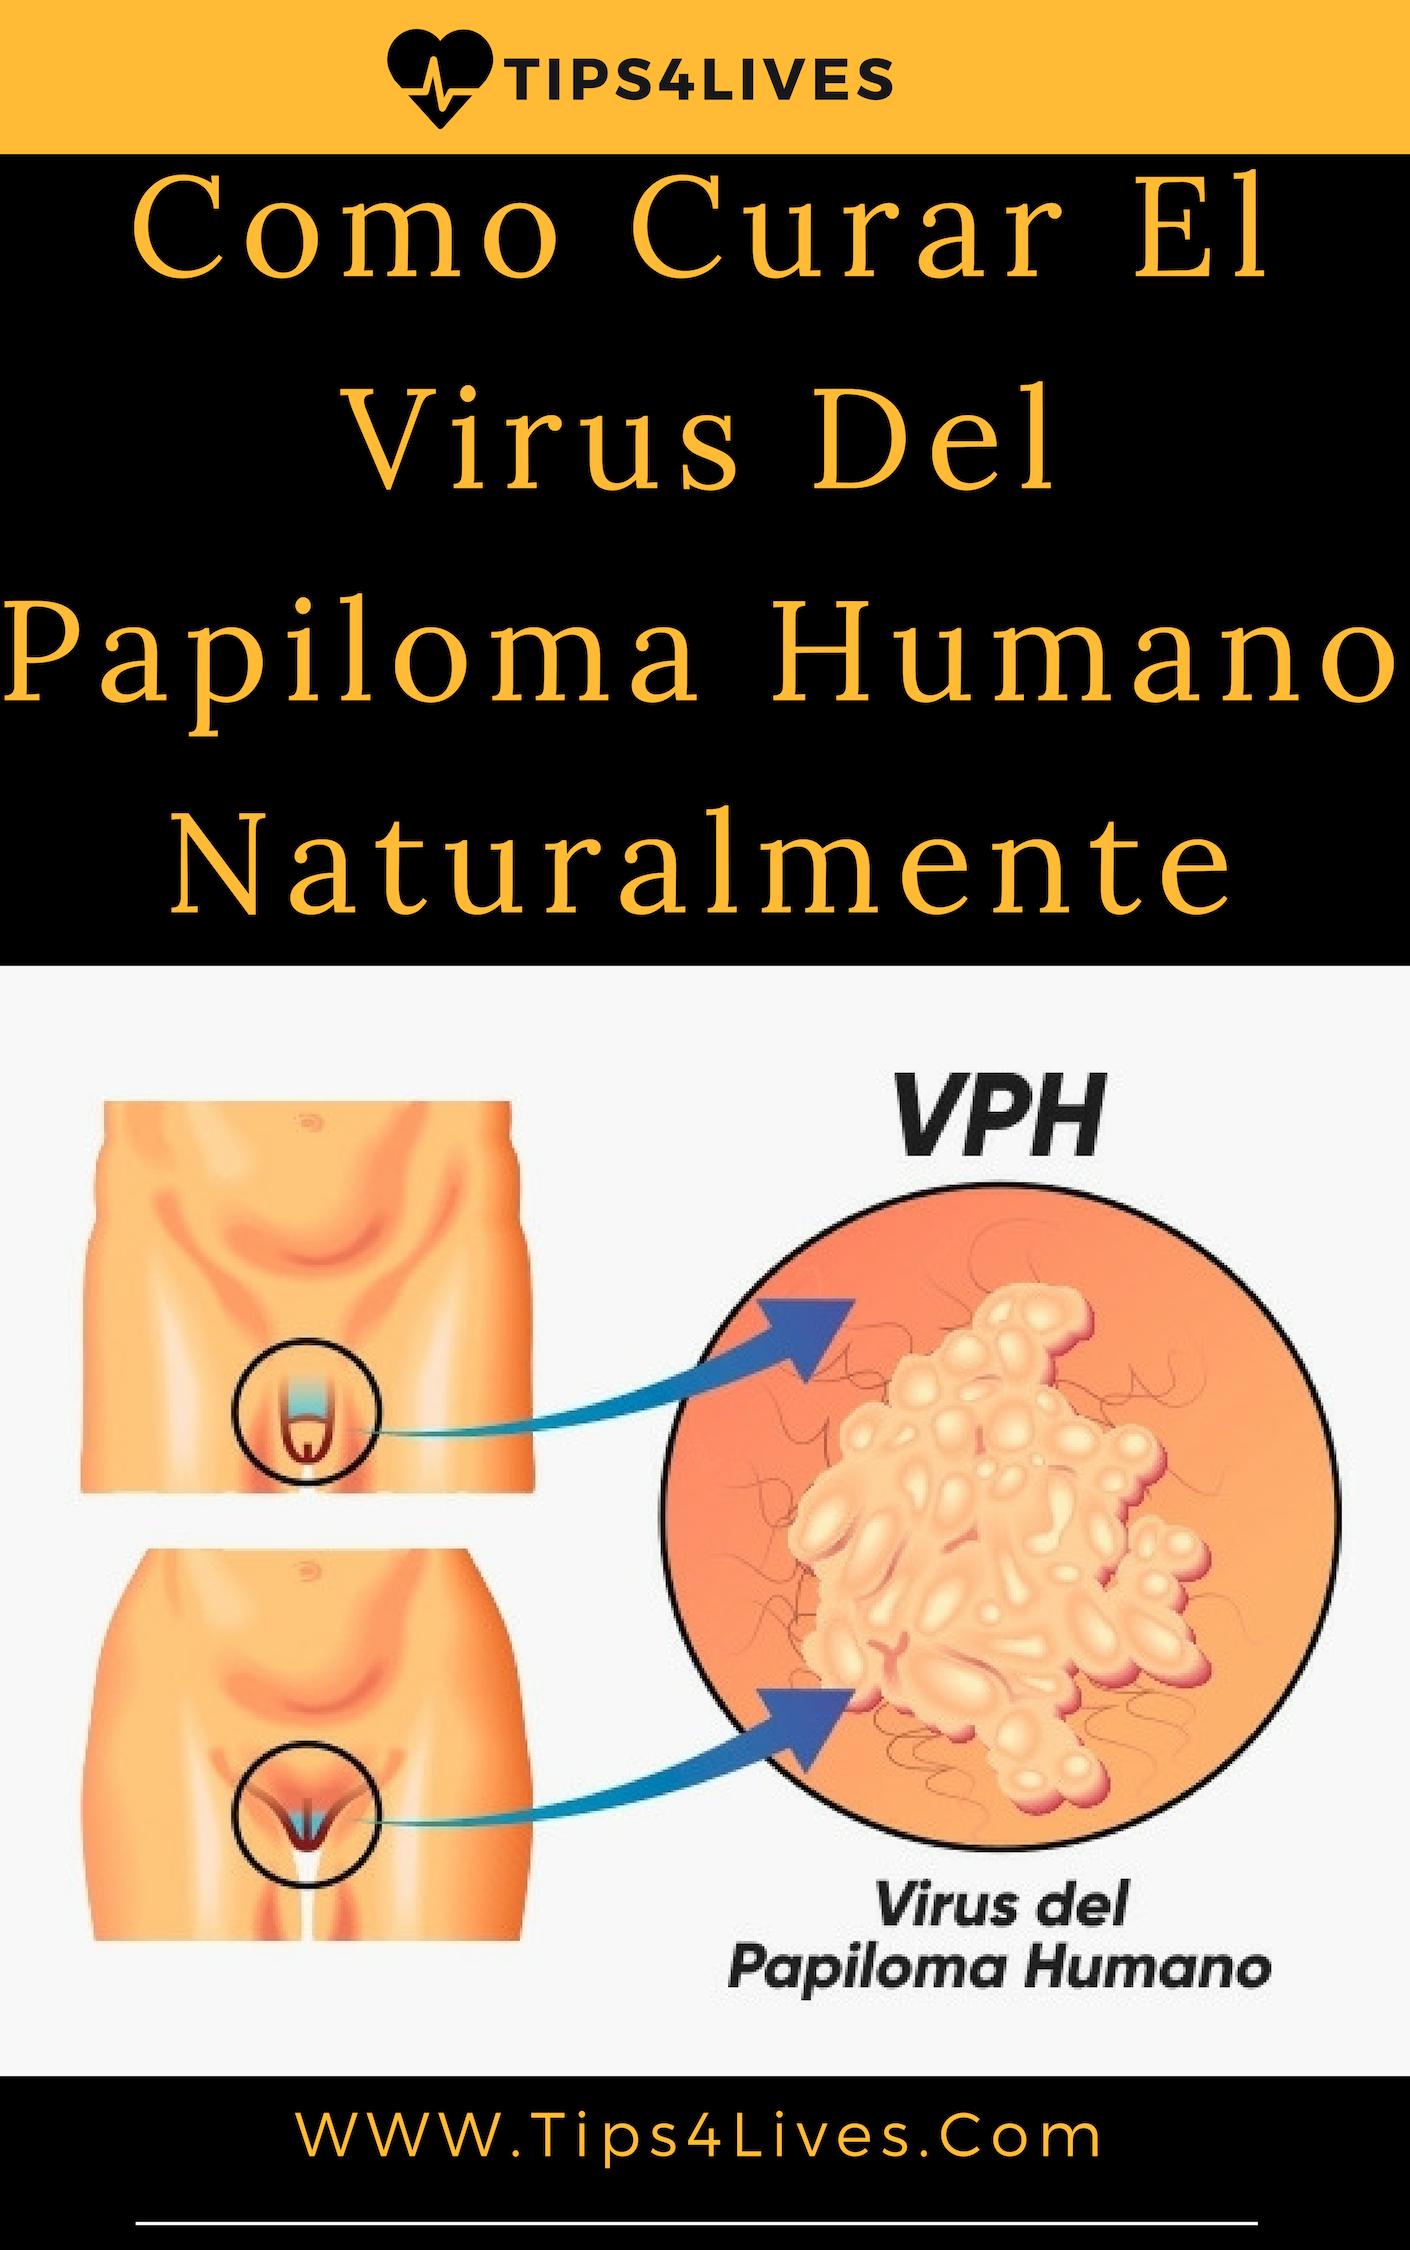 papiloma humano se quita papilloma xal